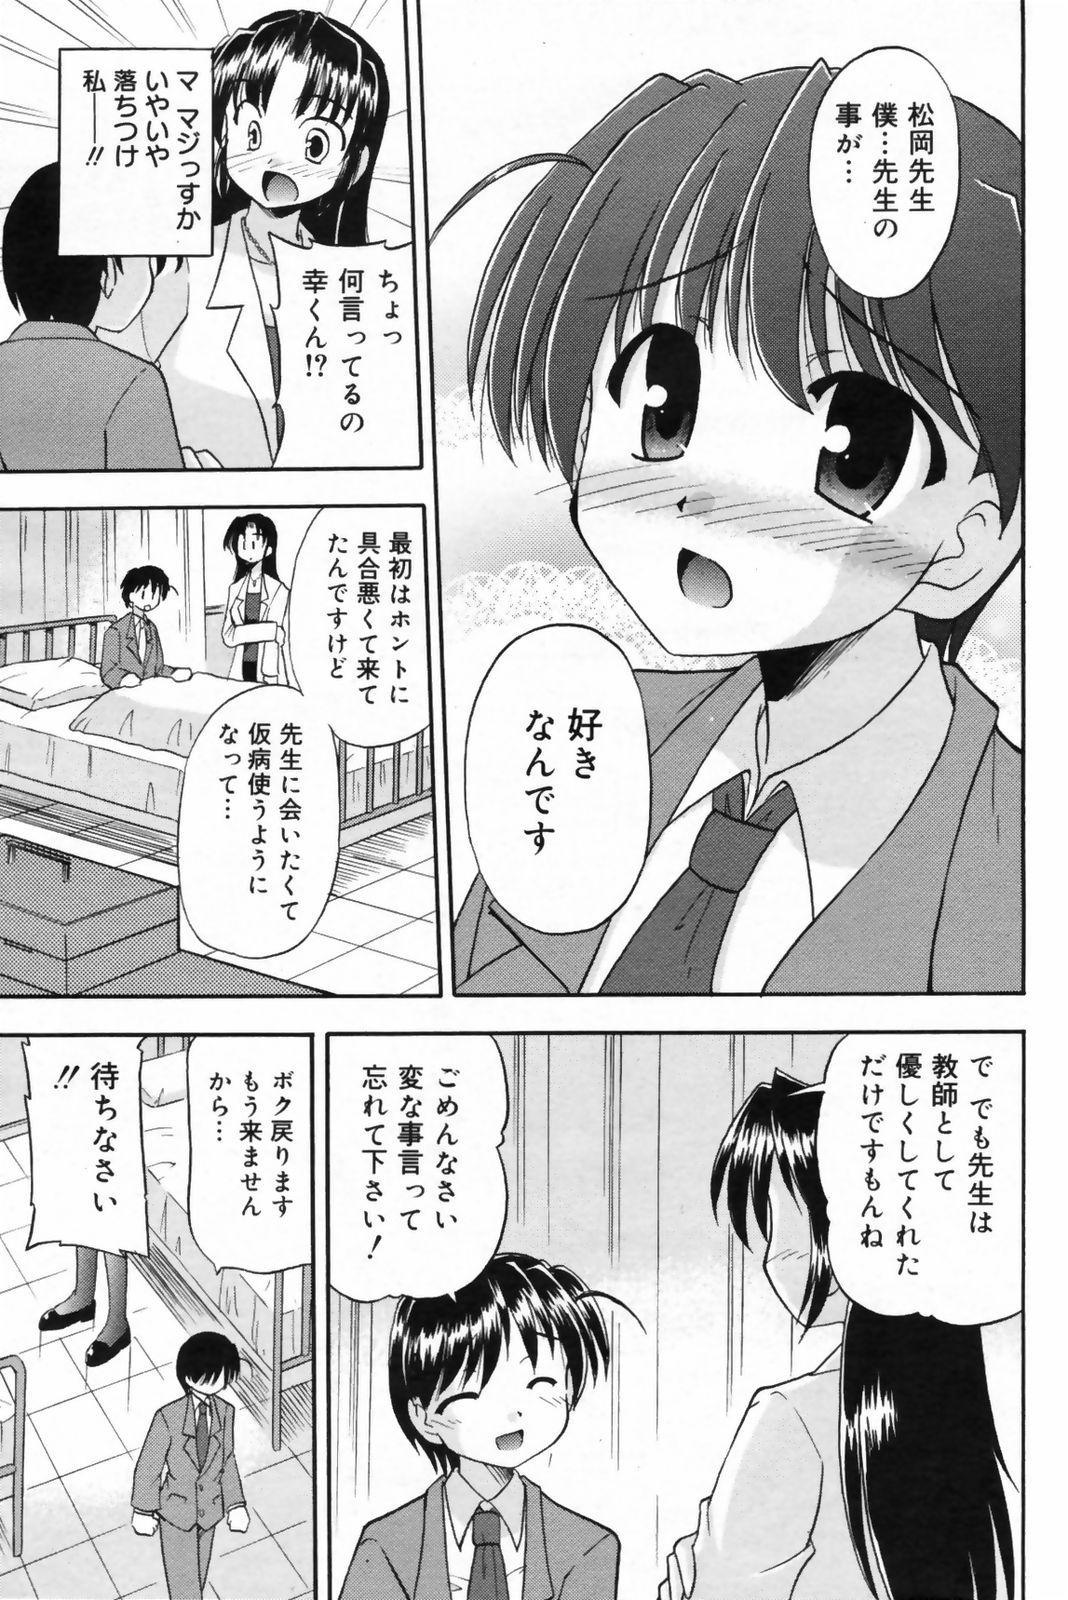 Manga Bangaichi 2009-02 Vol. 234 138